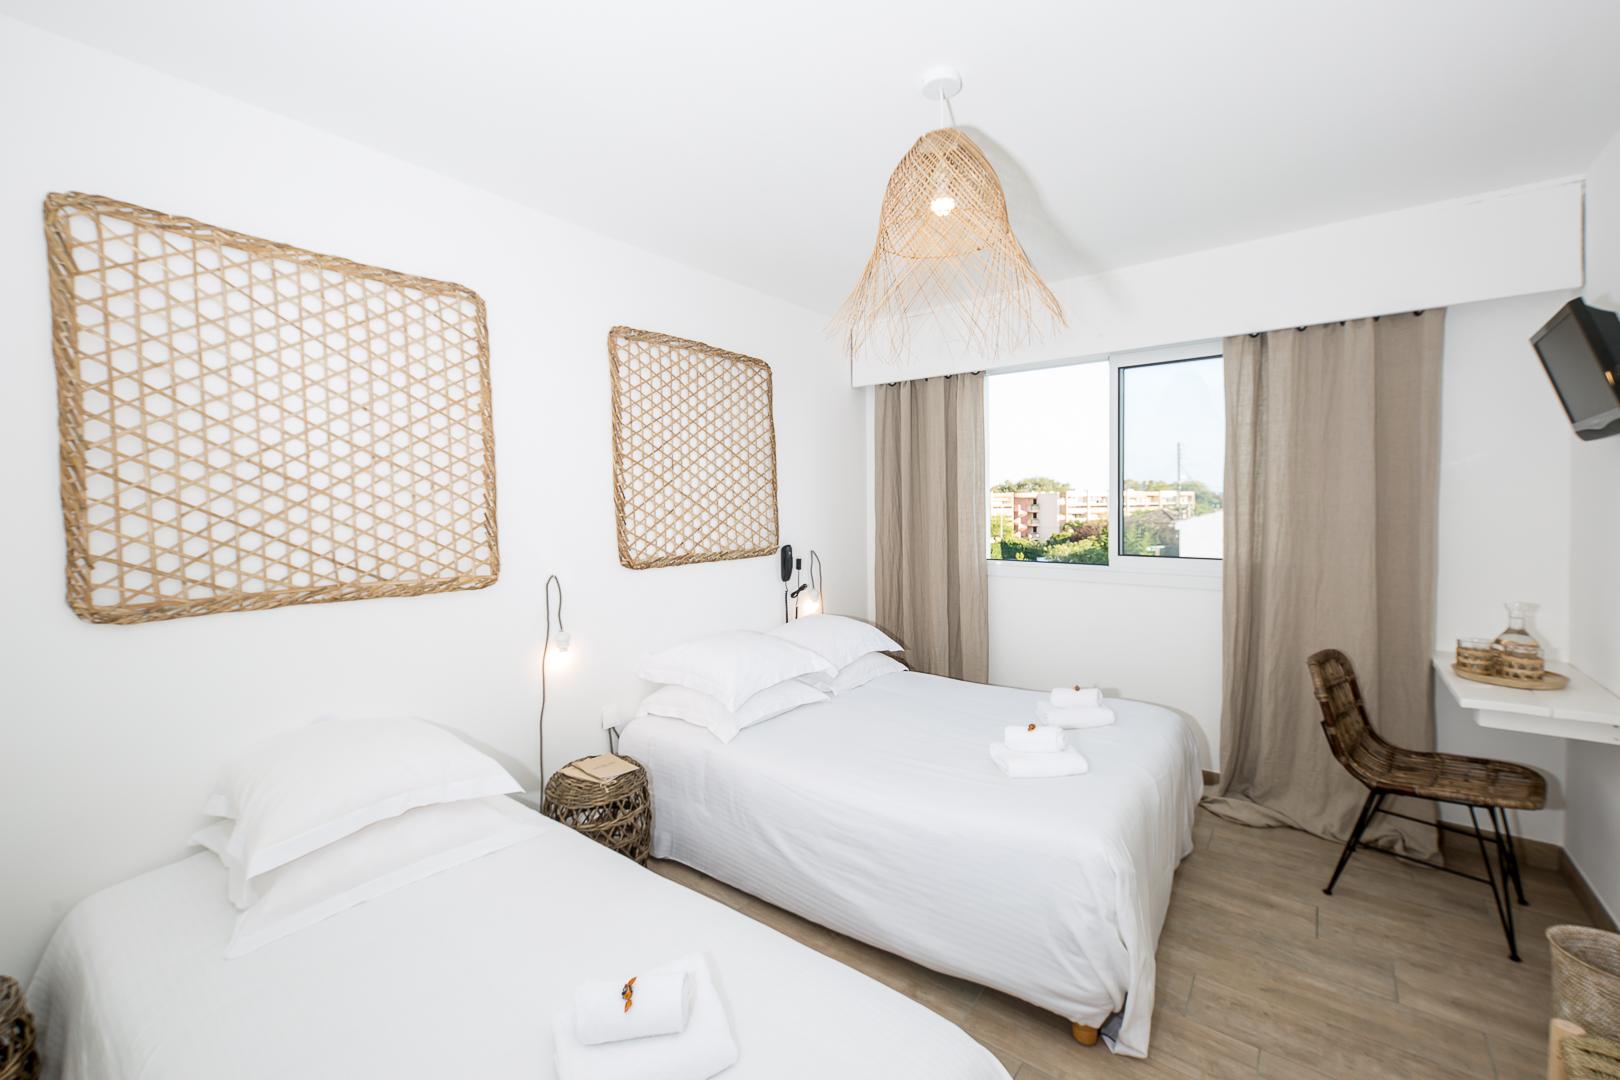 blanc-sable-hotel-vallauris-golfe-juan-chambre-double-triple-01